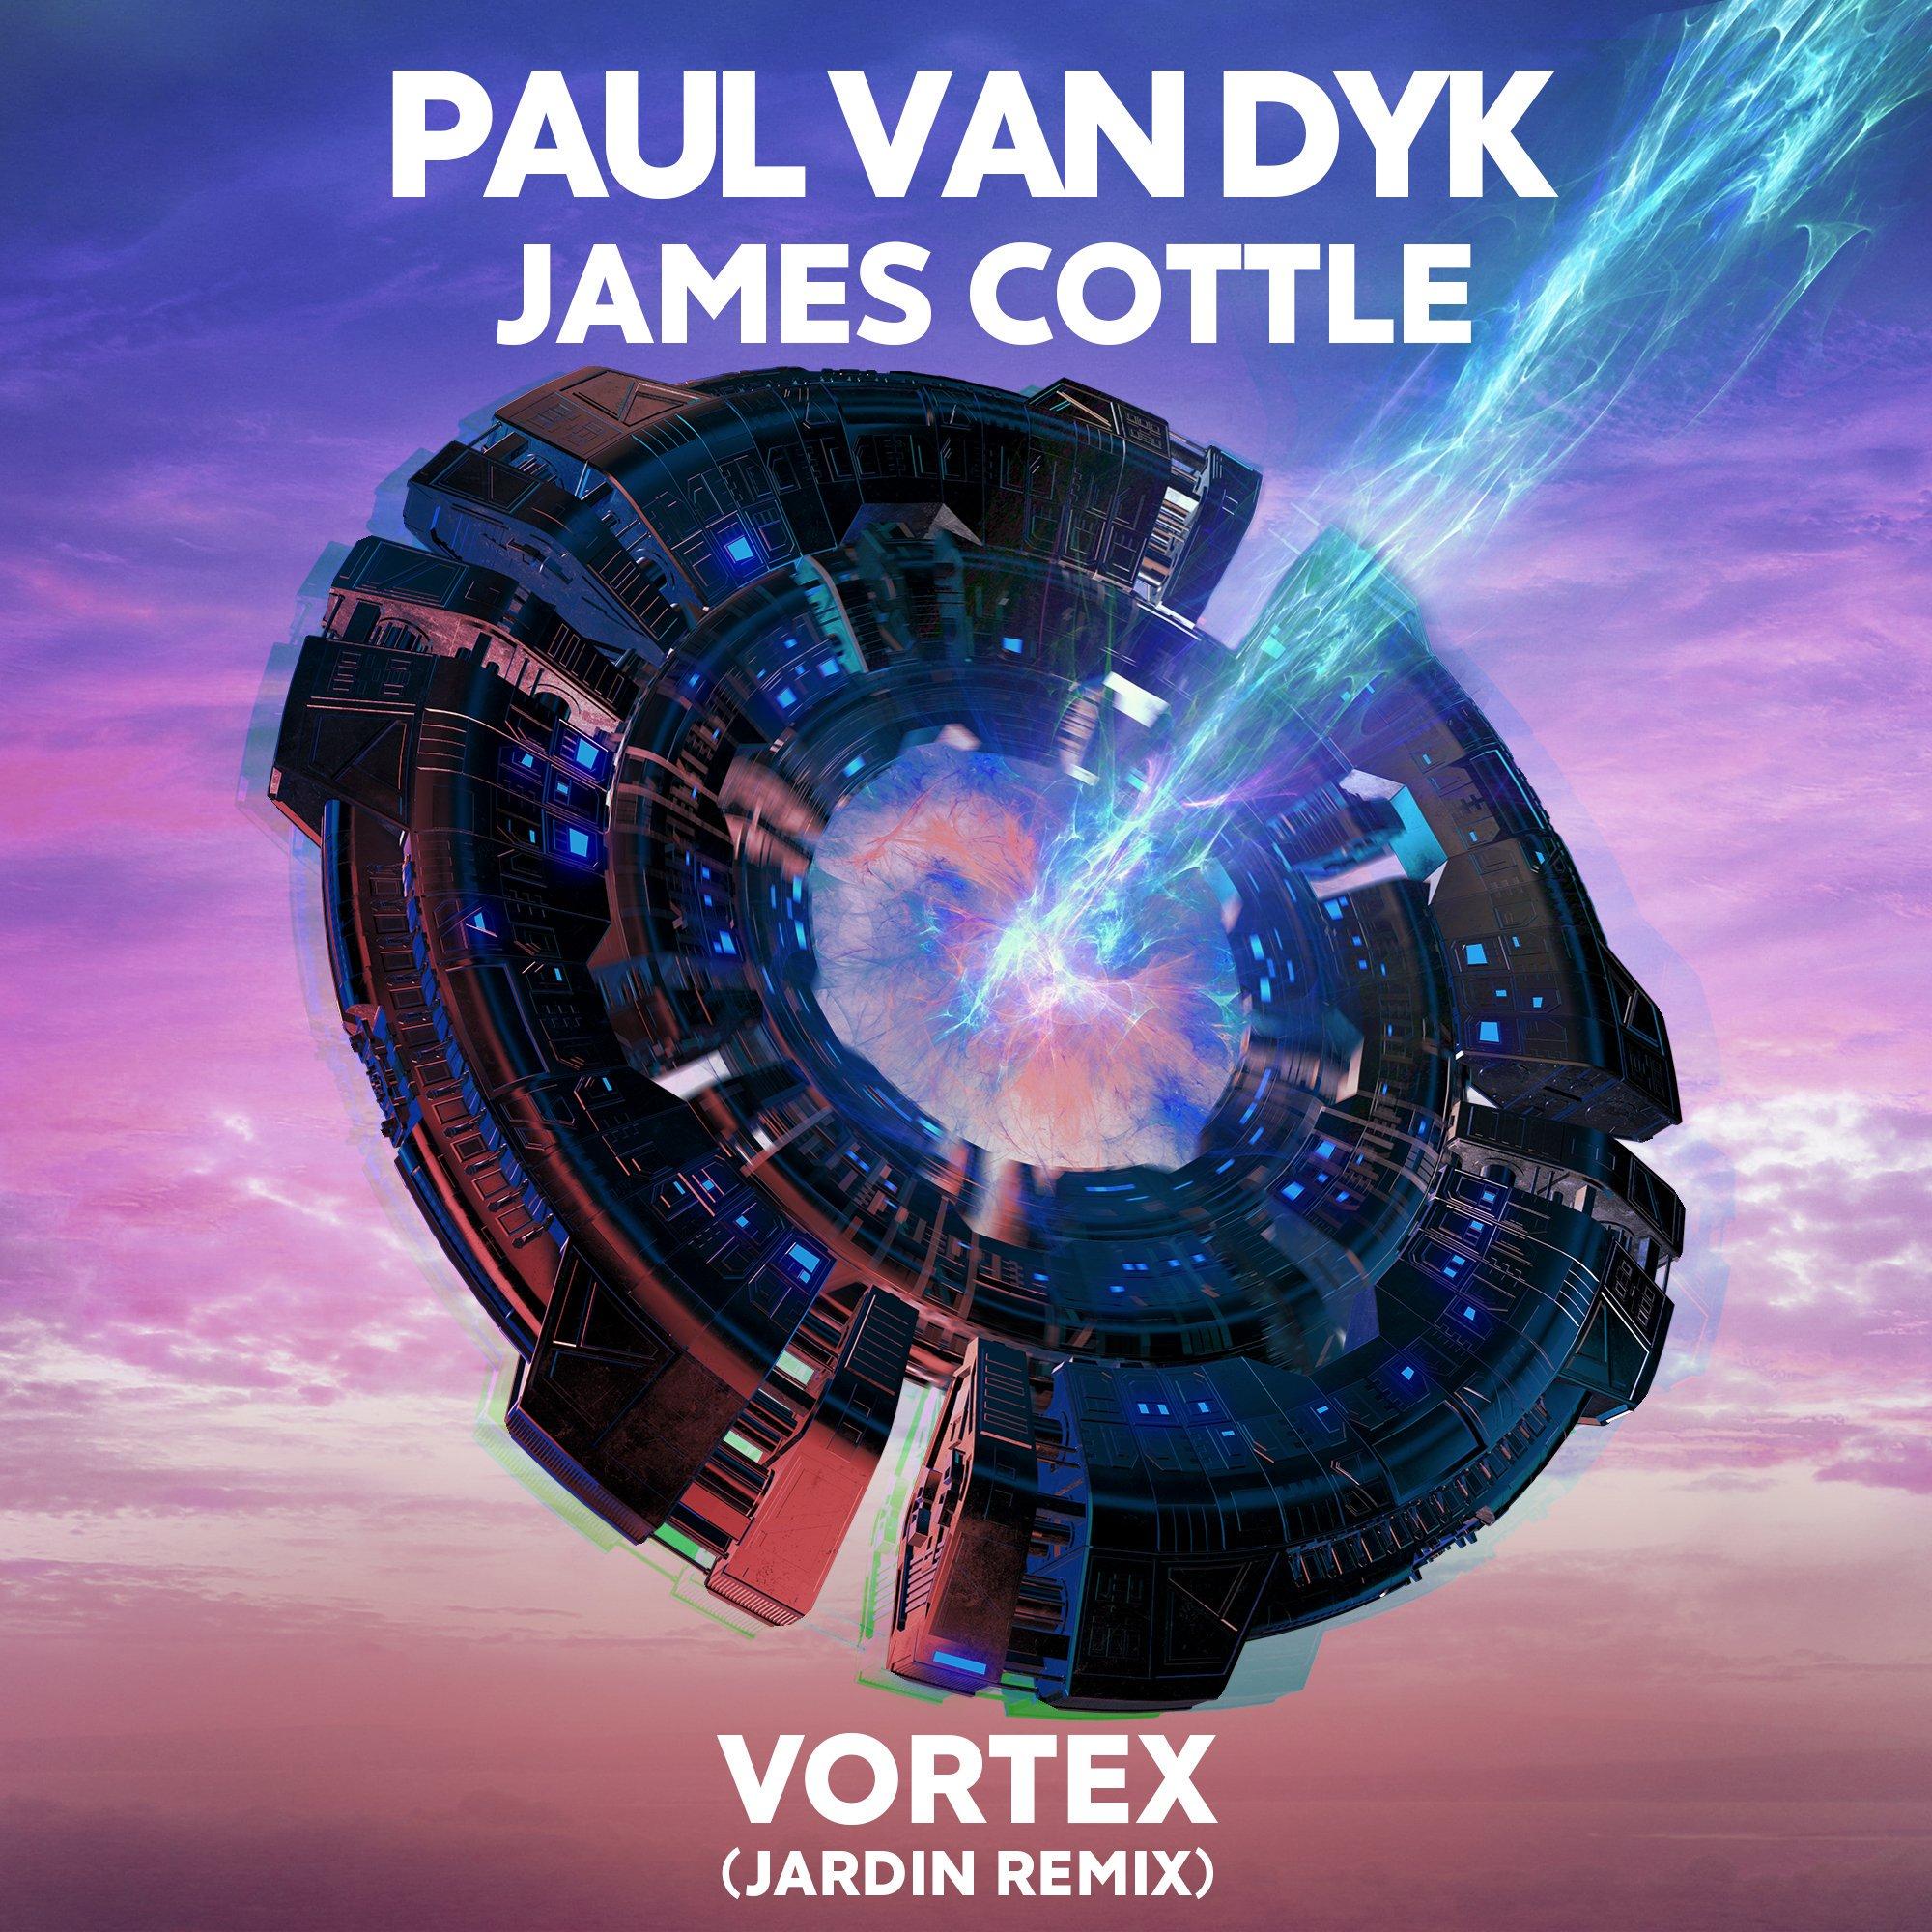 �� Get in the mood with @PAULVANDYK & @DJJamesCottle  VORTEX (@JardinMusic Remix) https://t.co/RaHRbAZr3t https://t.co/a1guEiEc3w